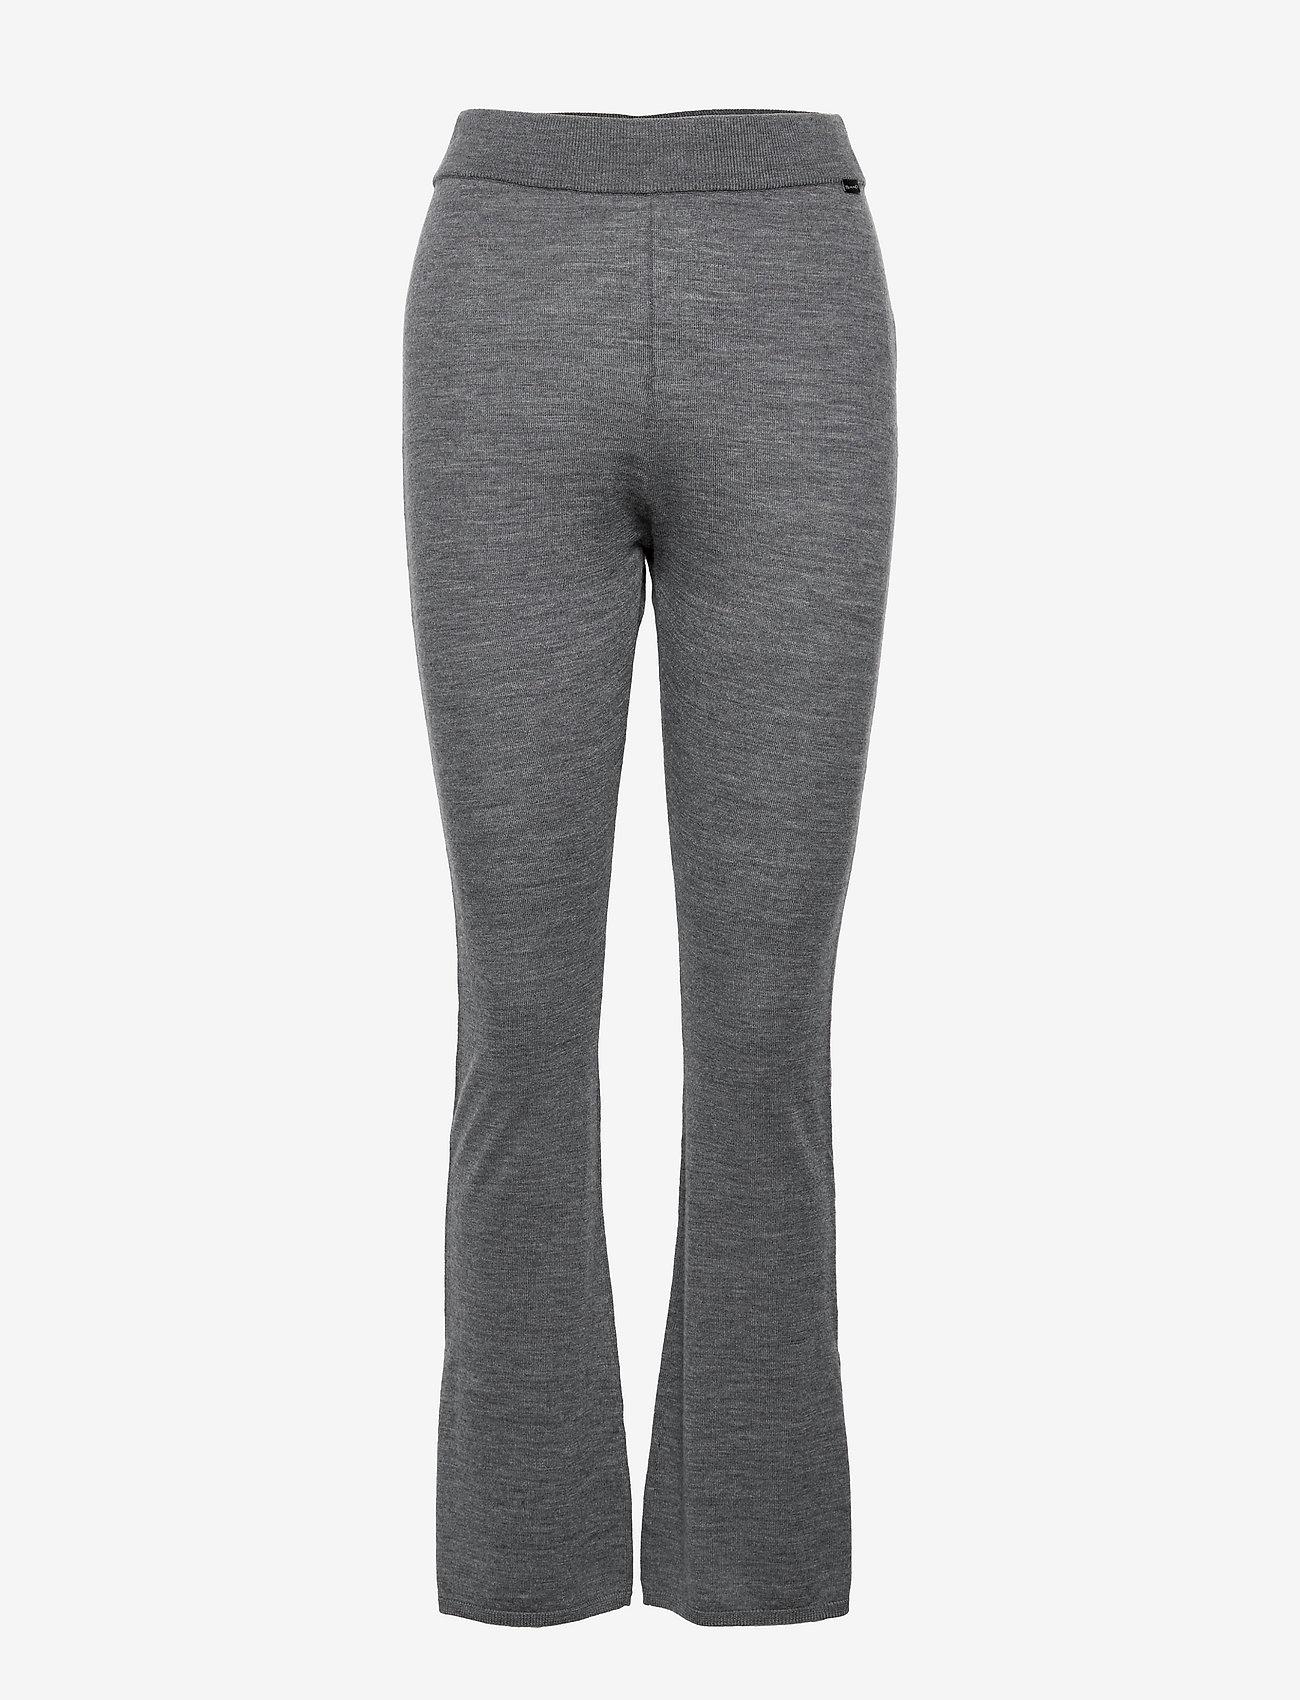 SAND - Fellini - Dharma - casual broeken - medium grey - 0